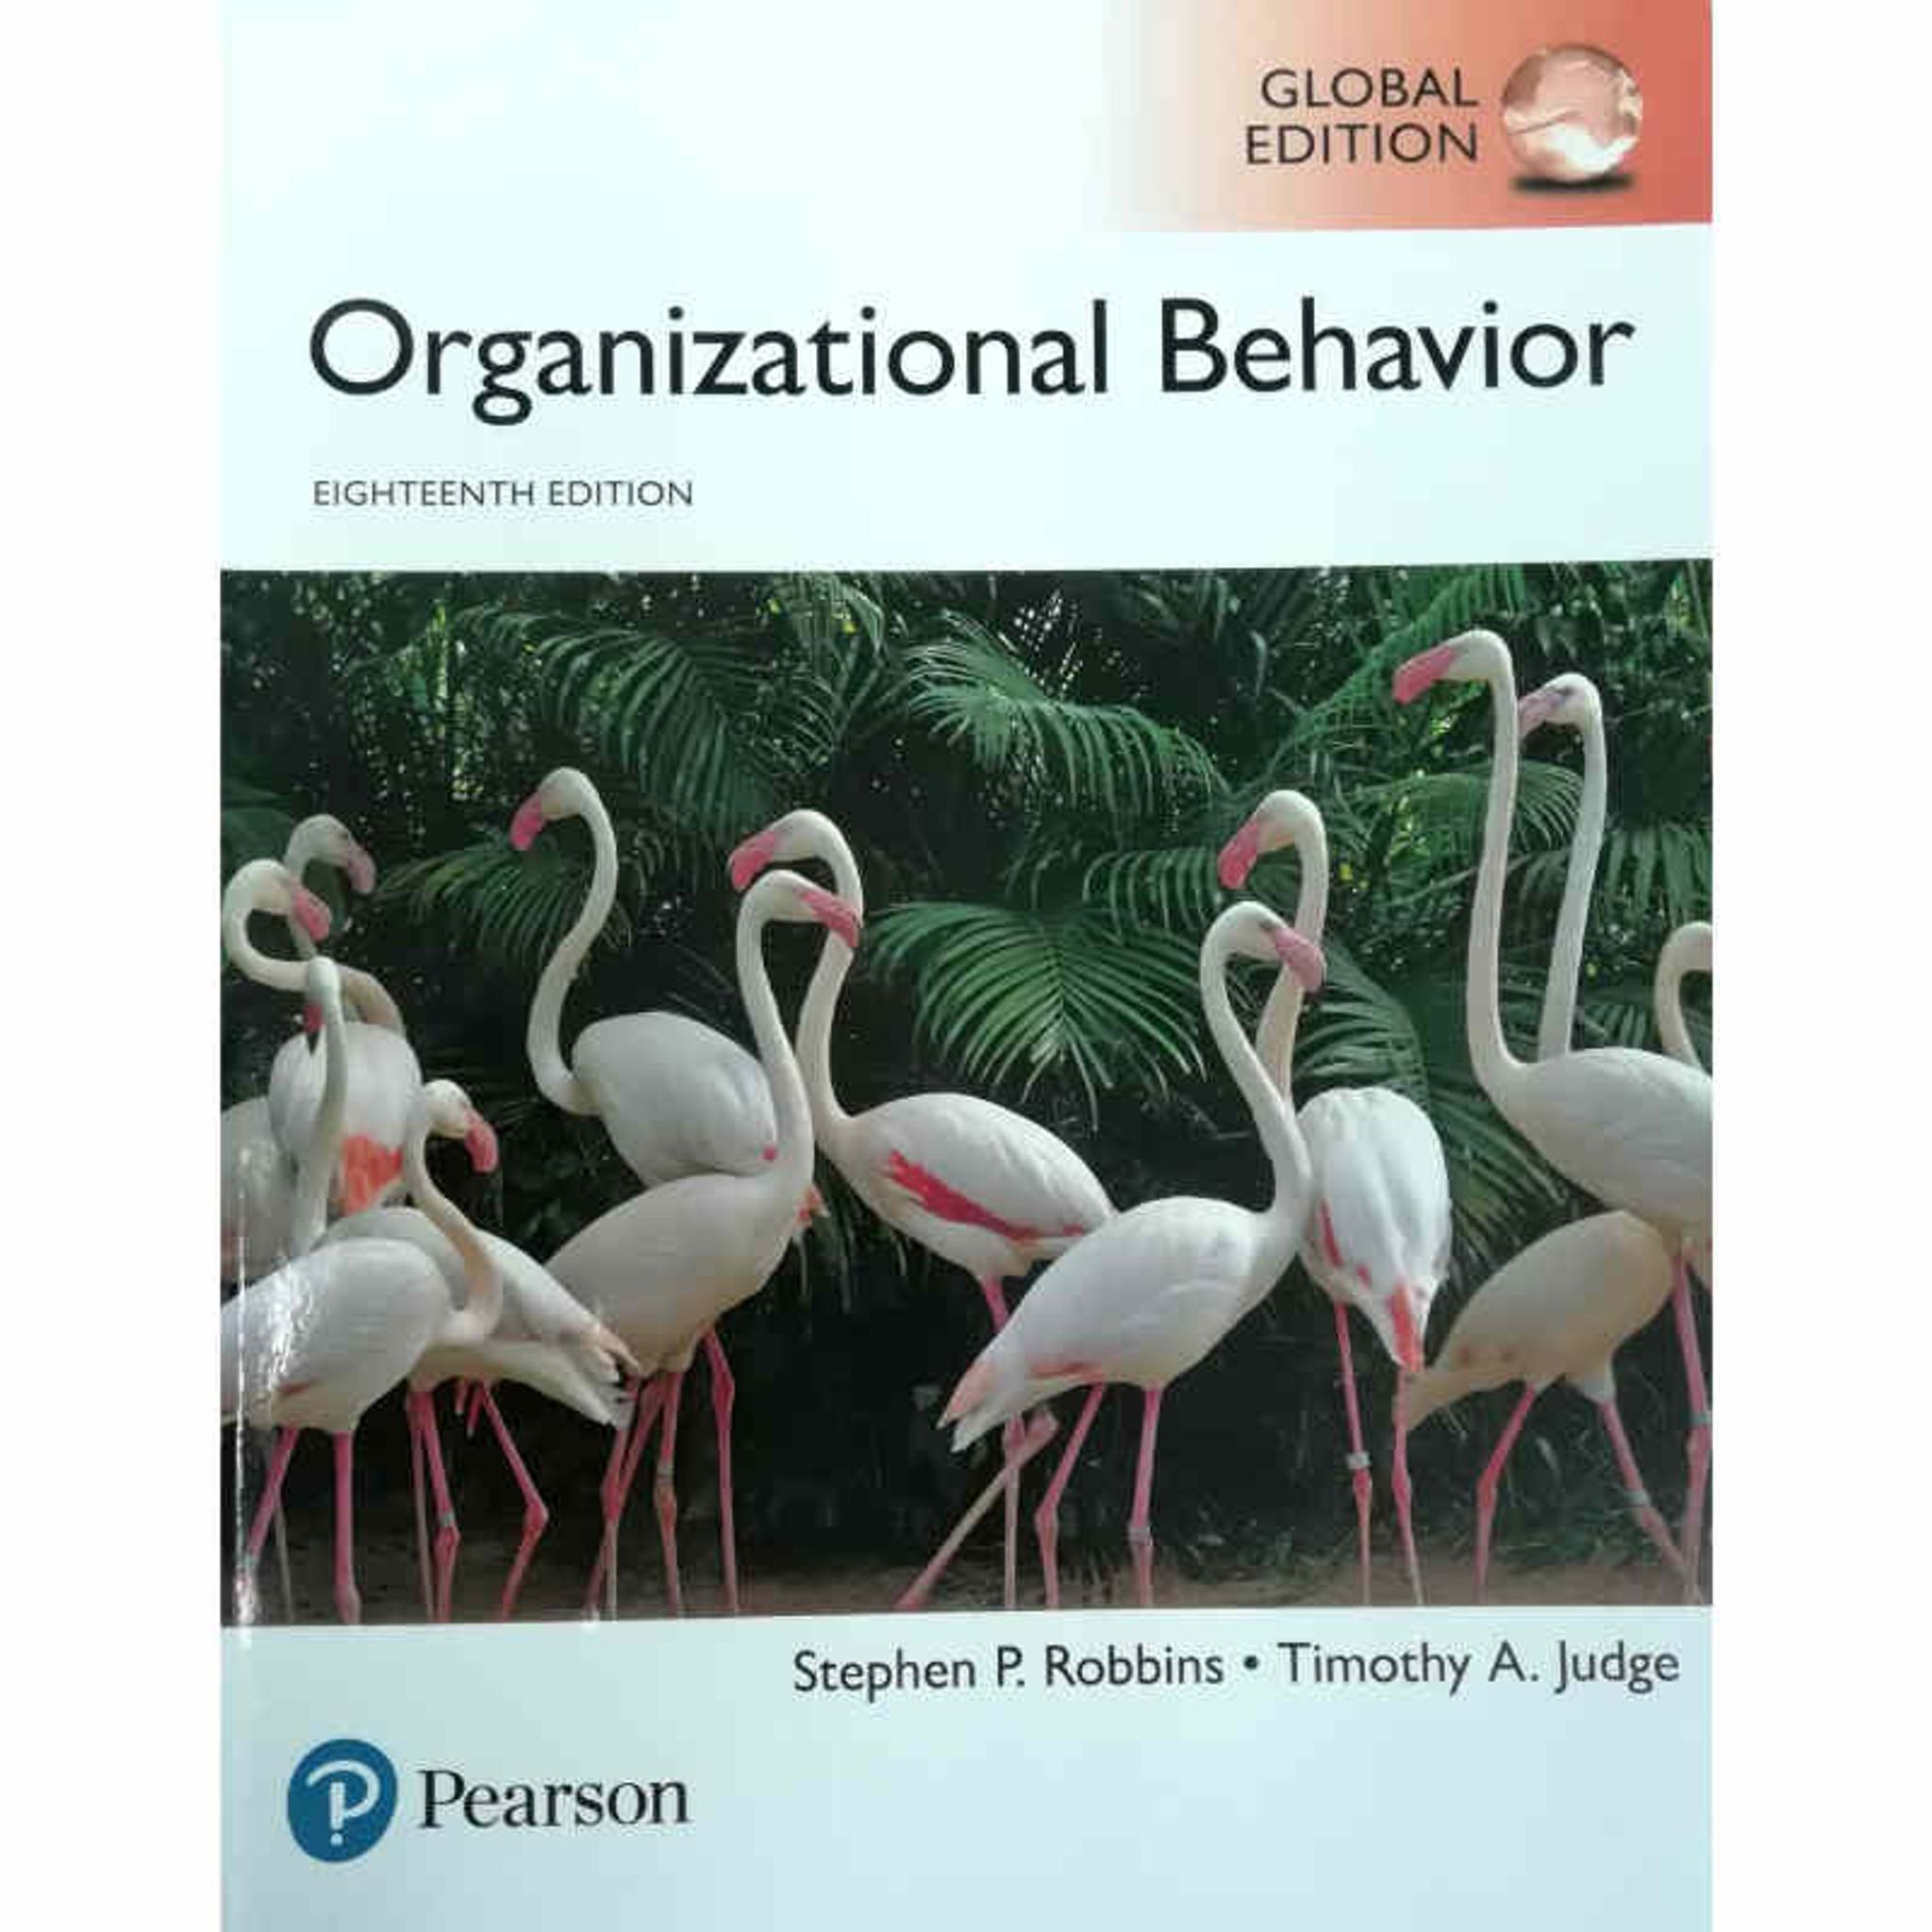 Organizational Behavior 18th Edition Stephen P Robbins And Timothy A Judge IE